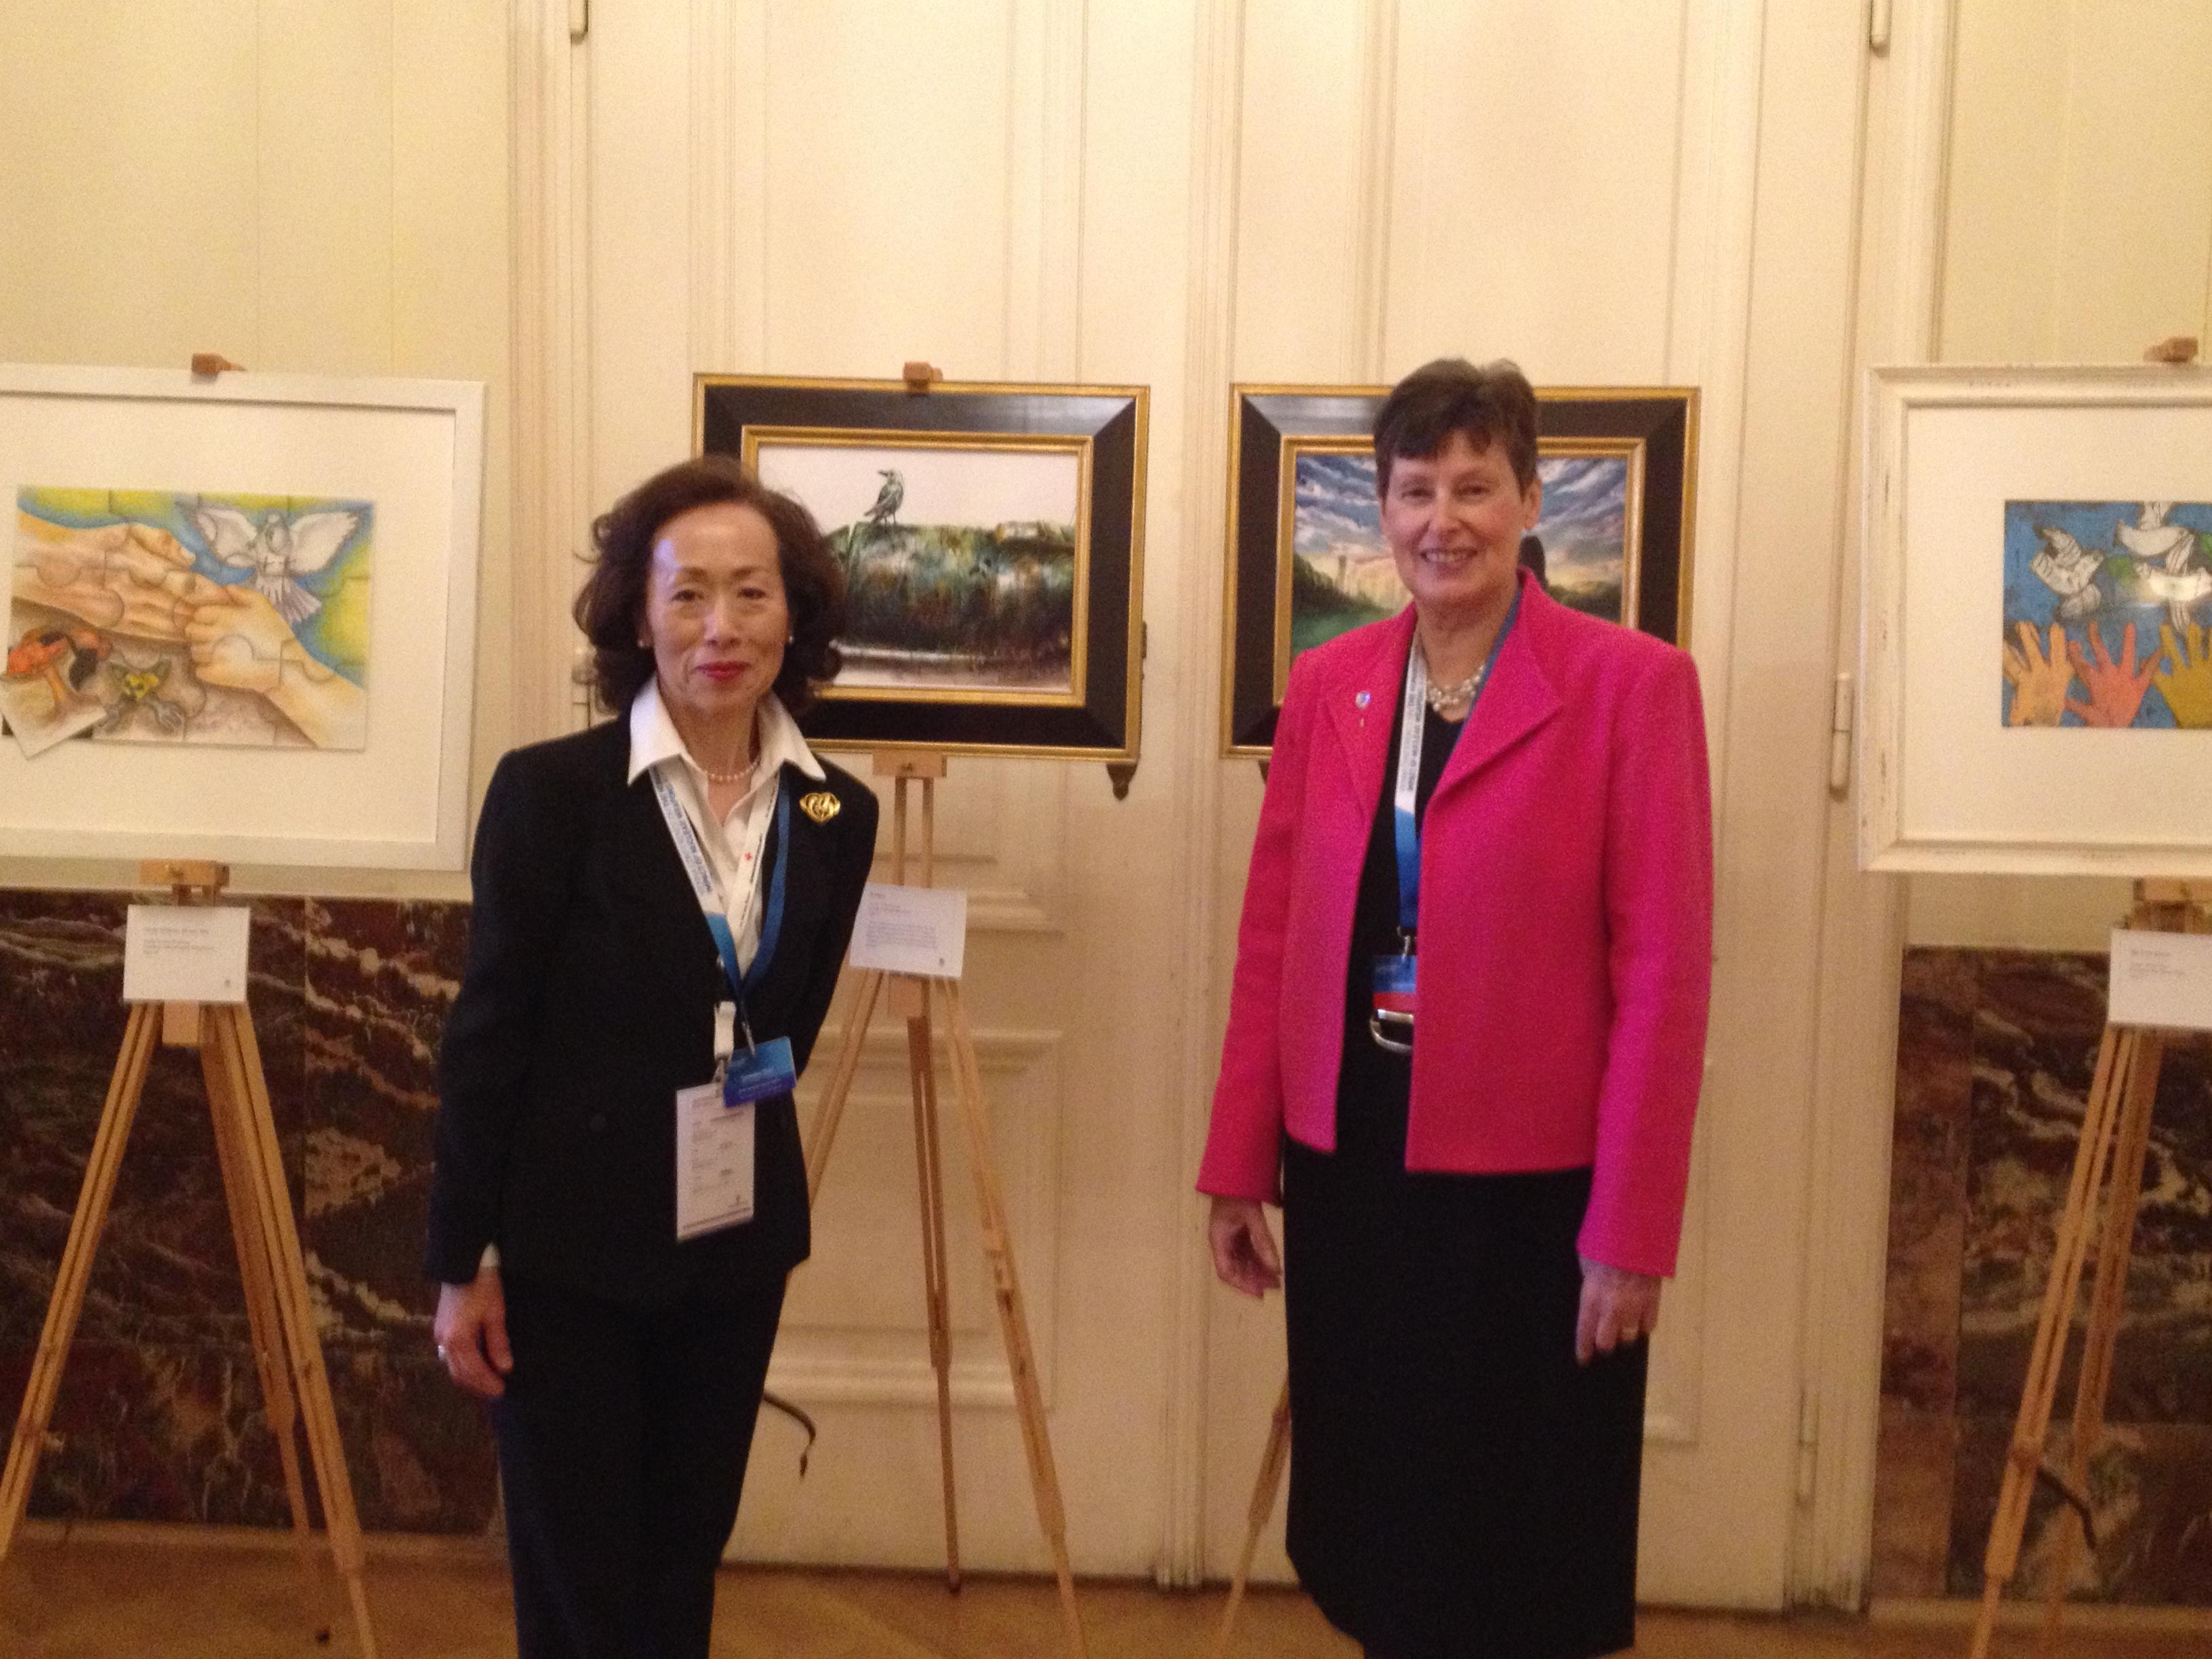 Ms. Torii and UN High Rep. Kane